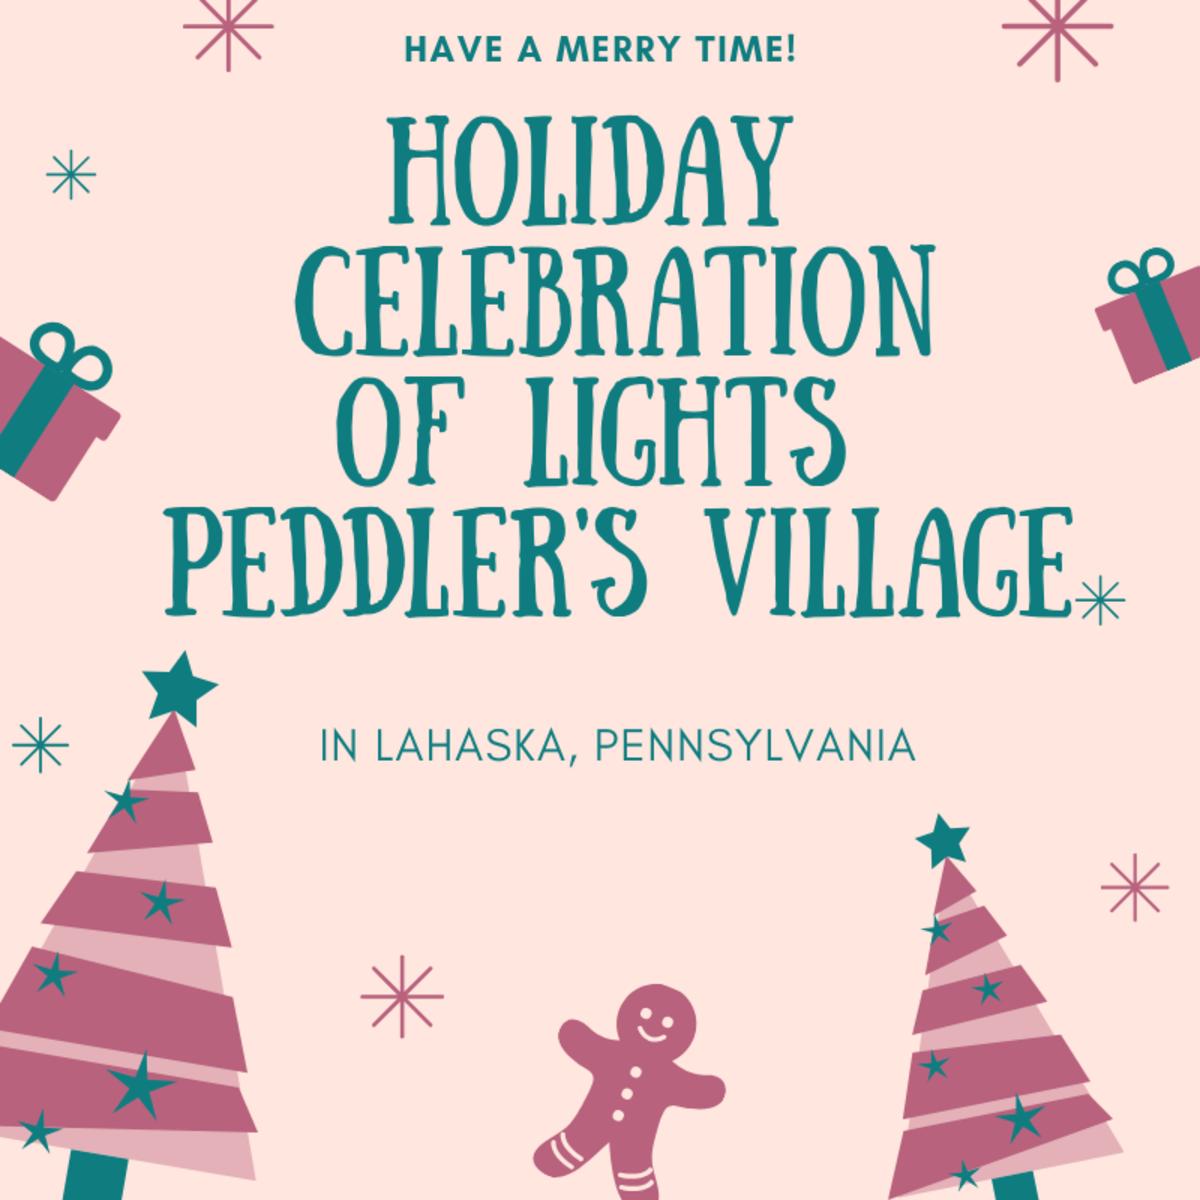 Holiday Celebration at Peddler's Village Lahaska Pennsylvania